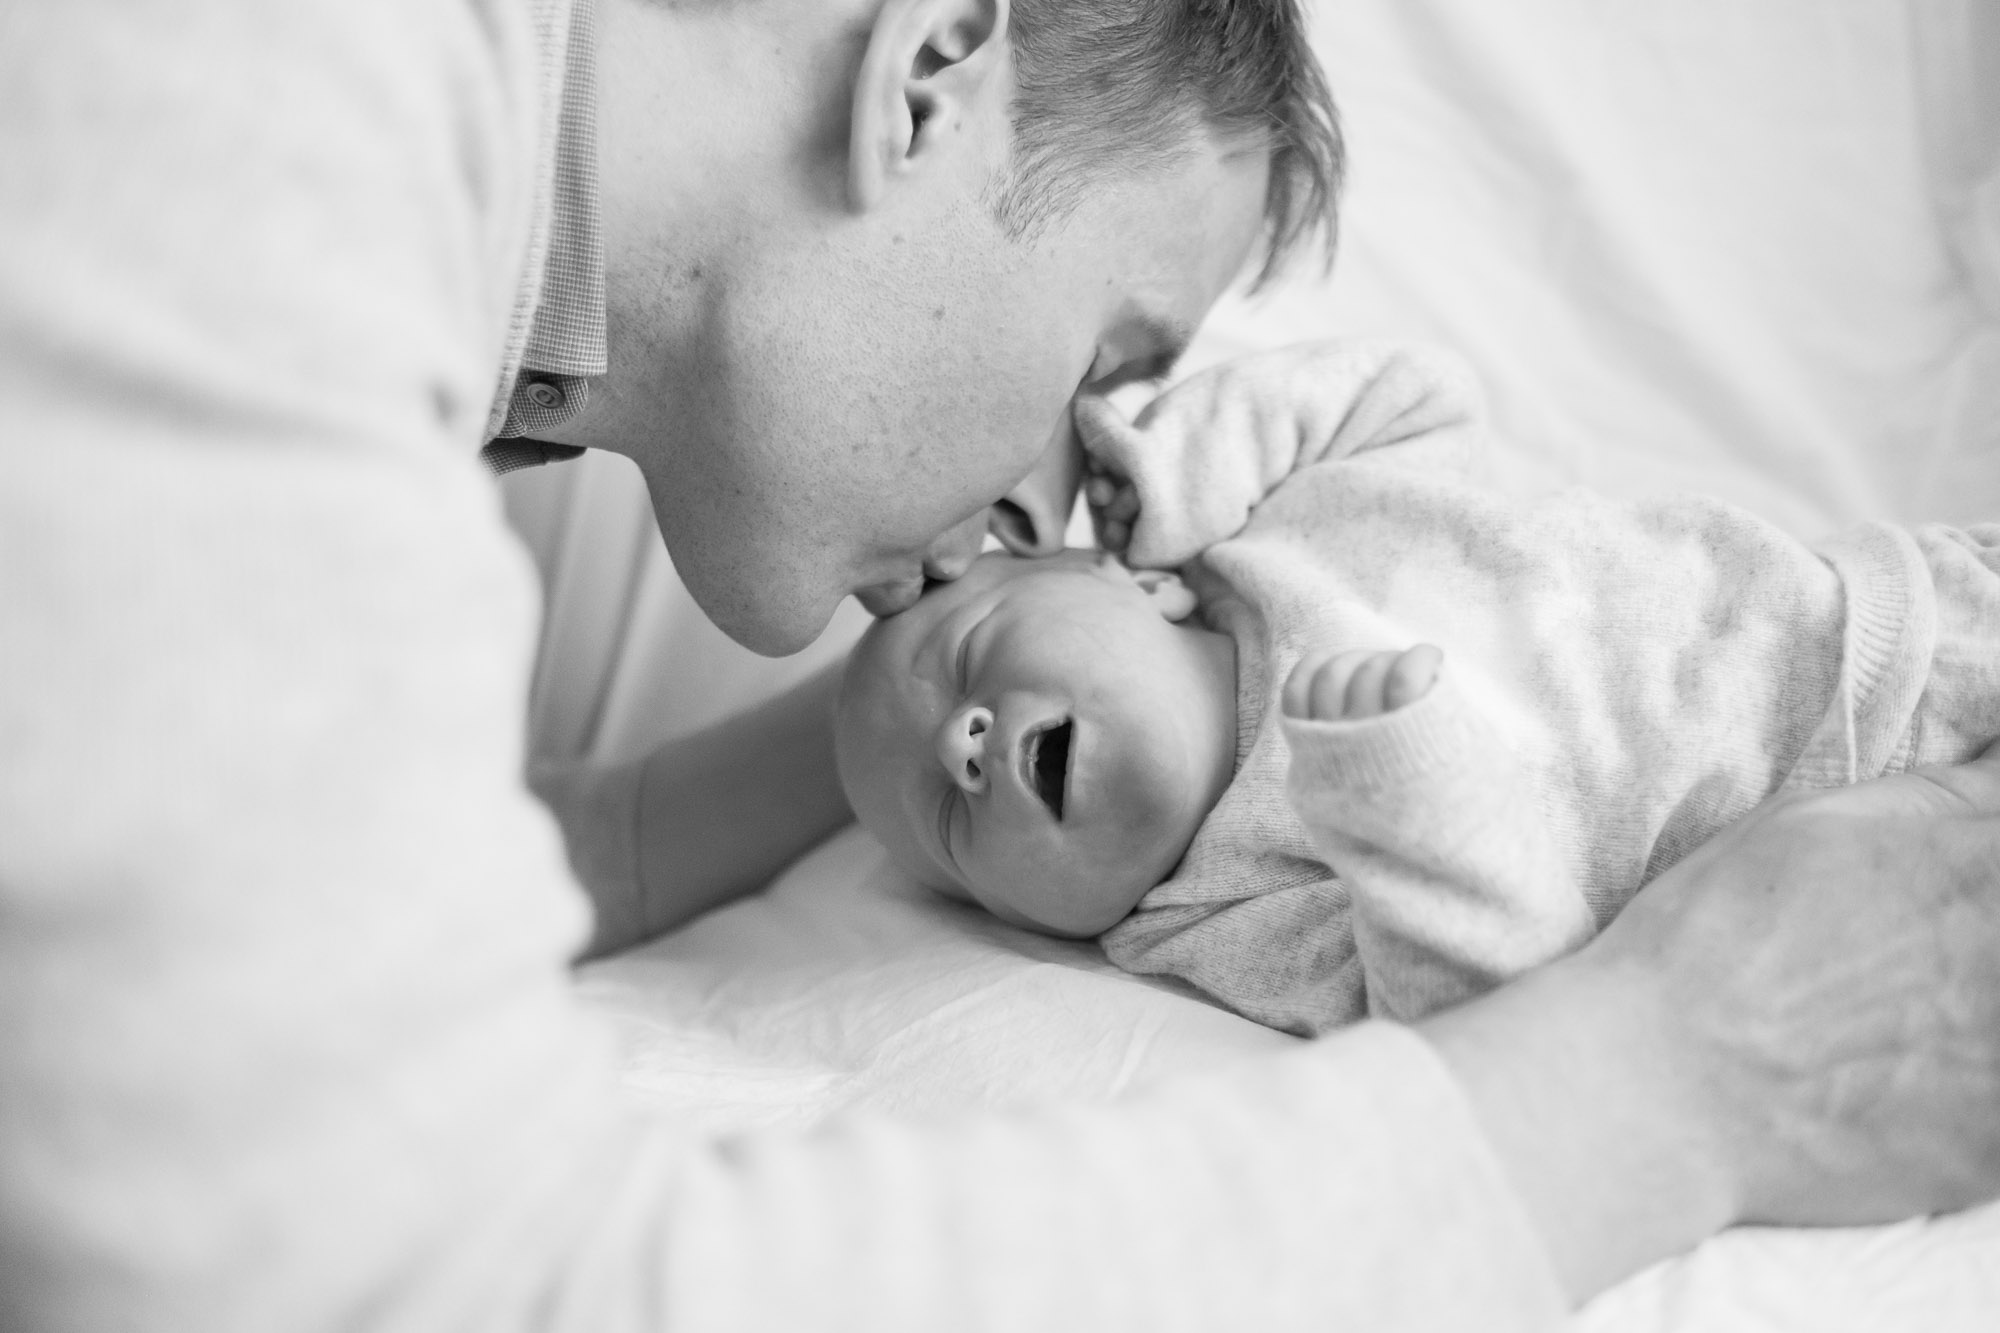 newborn-baby-family-portrait-photographer-136.jpg